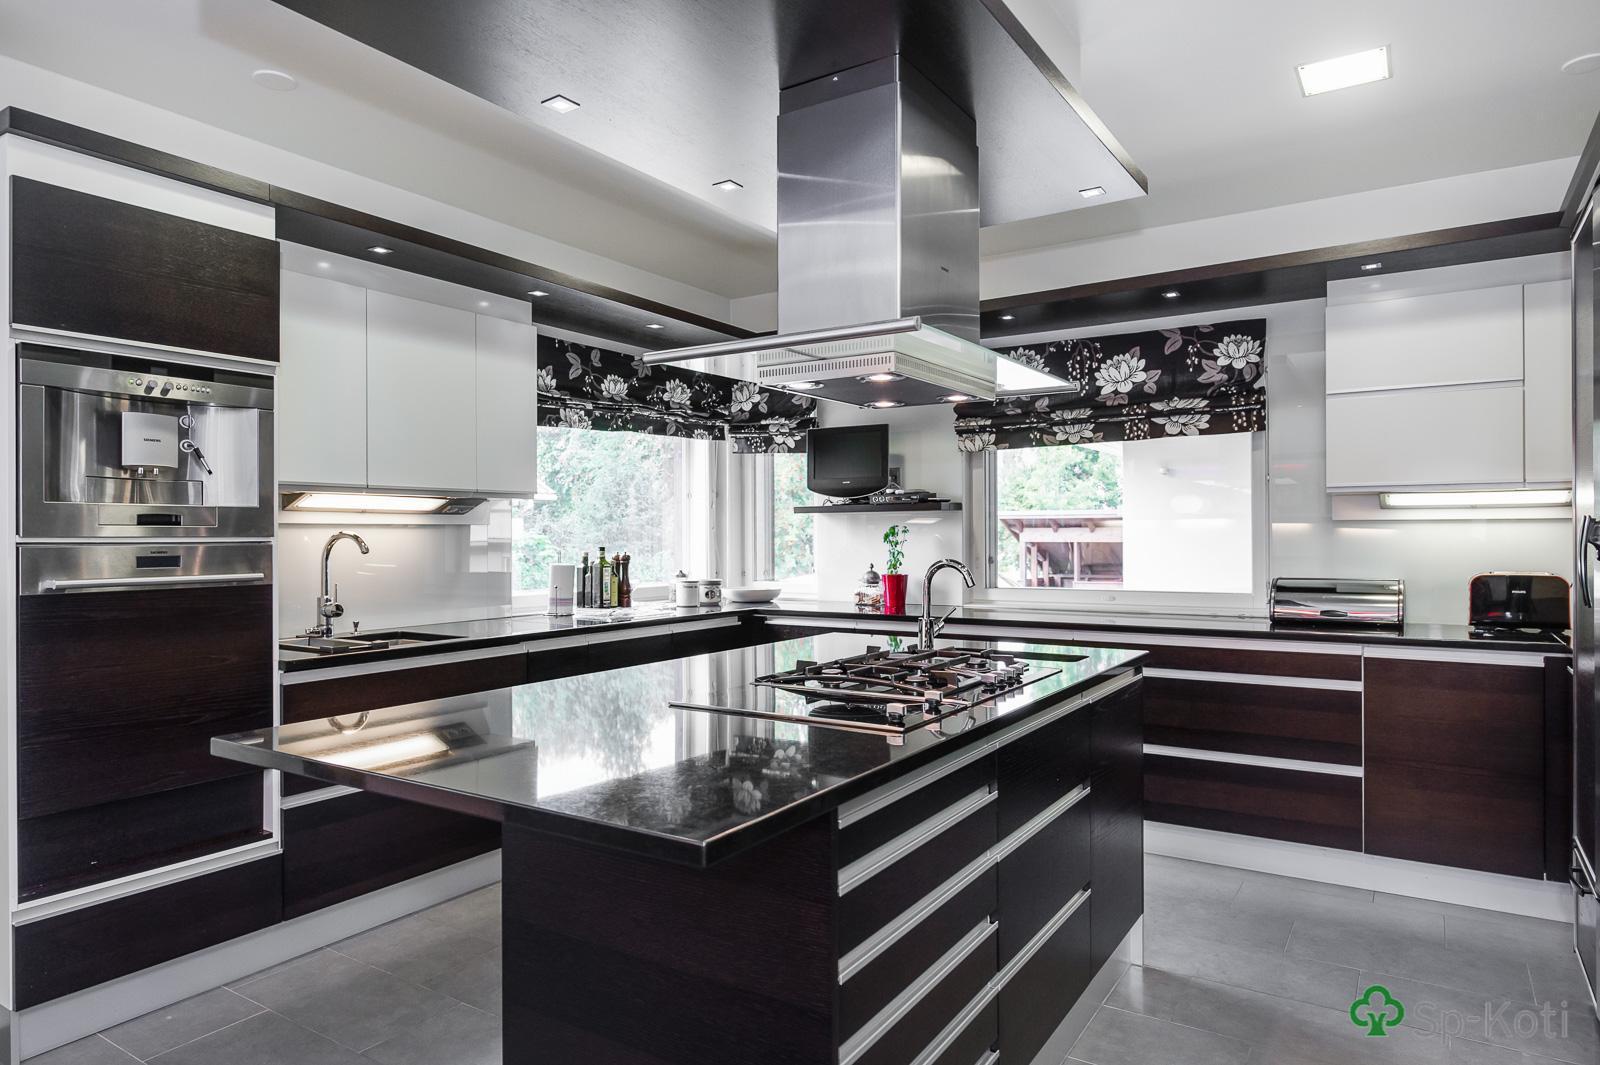 Moderni keittiö 9514683  Etuovi com Ideat & vinkit